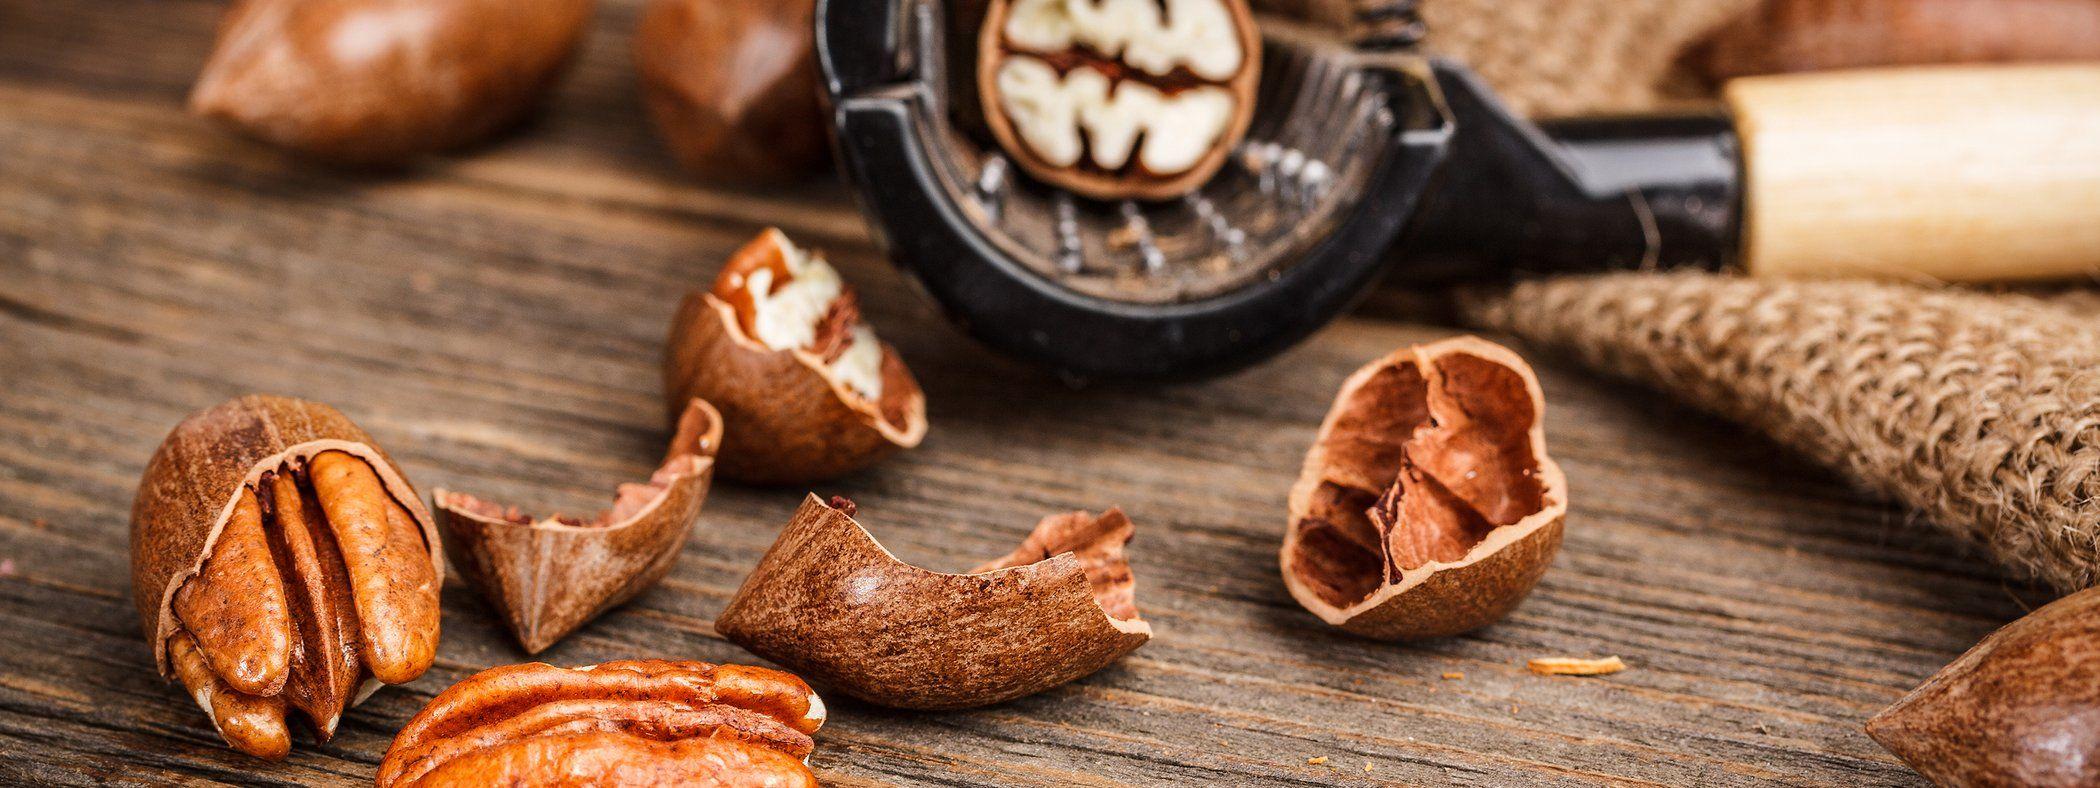 Buy delicious orchard fresh pecans! Order Pecan Pie, Gift